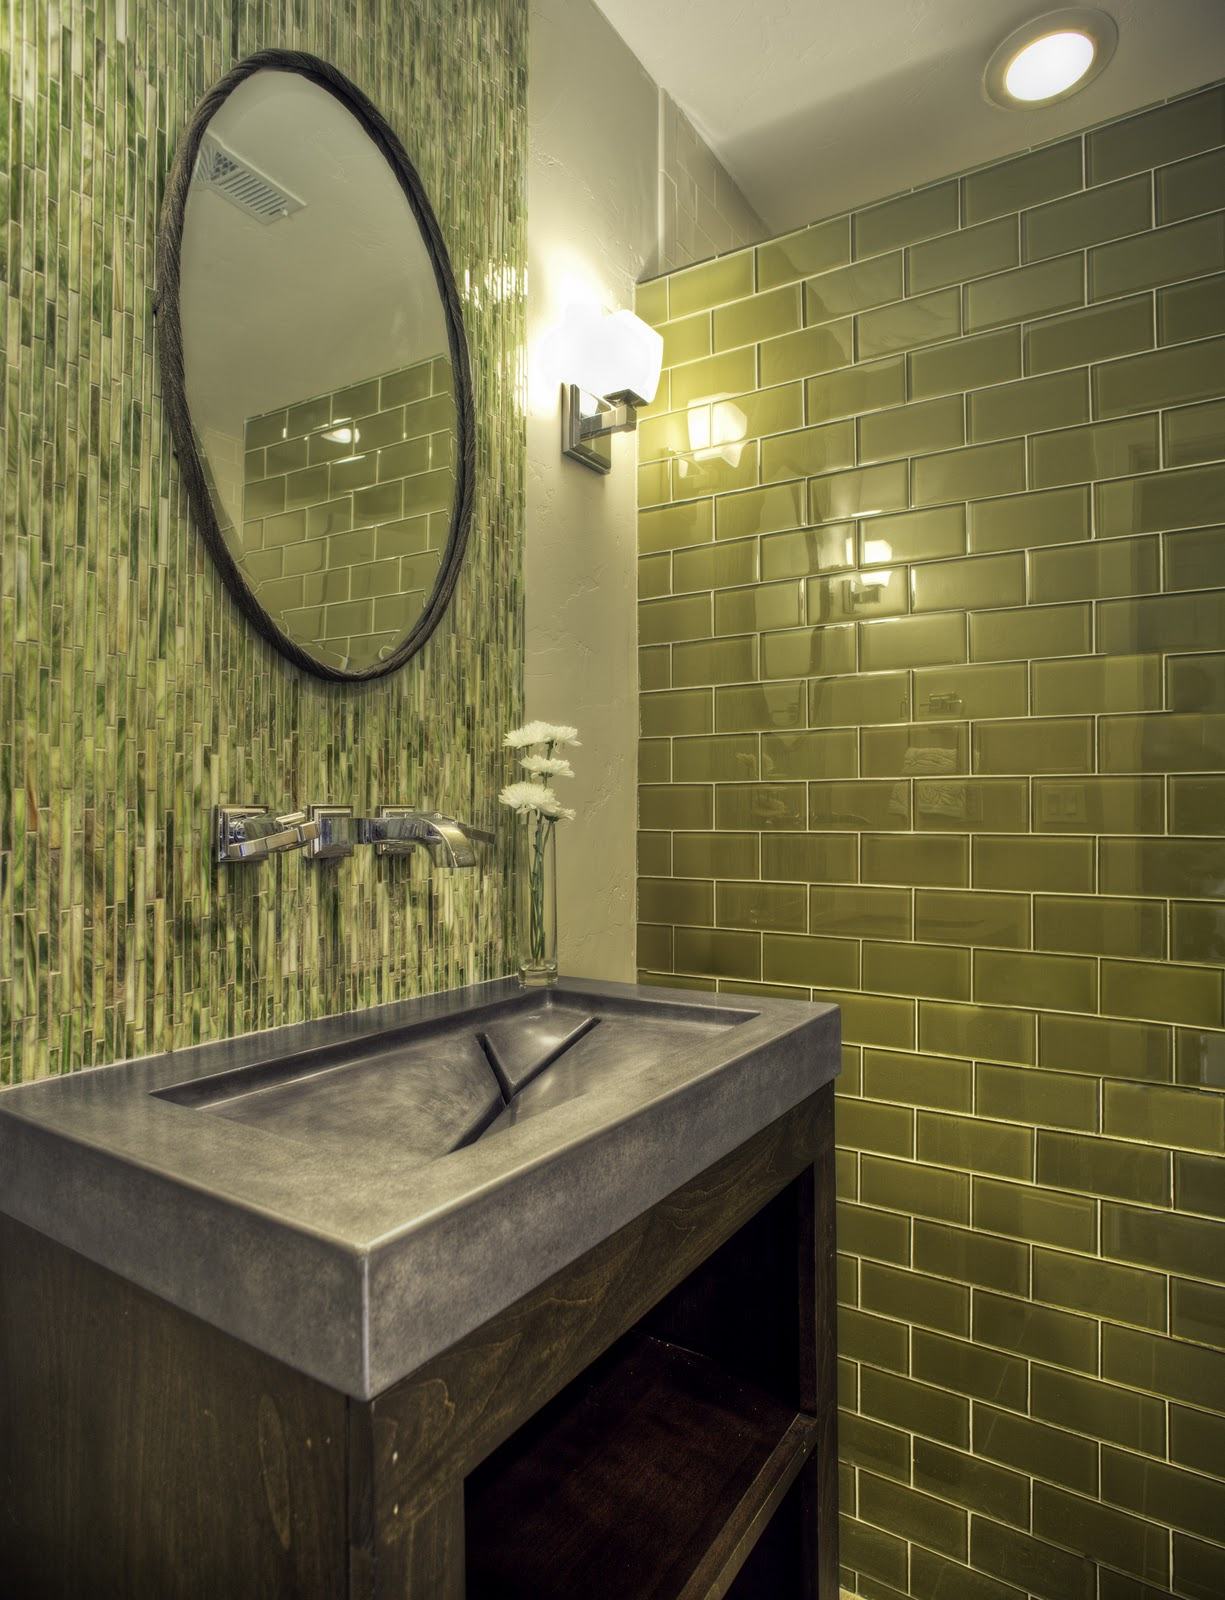 Home renovation 2015 2015 home design ideas for Olive bathroom ideas